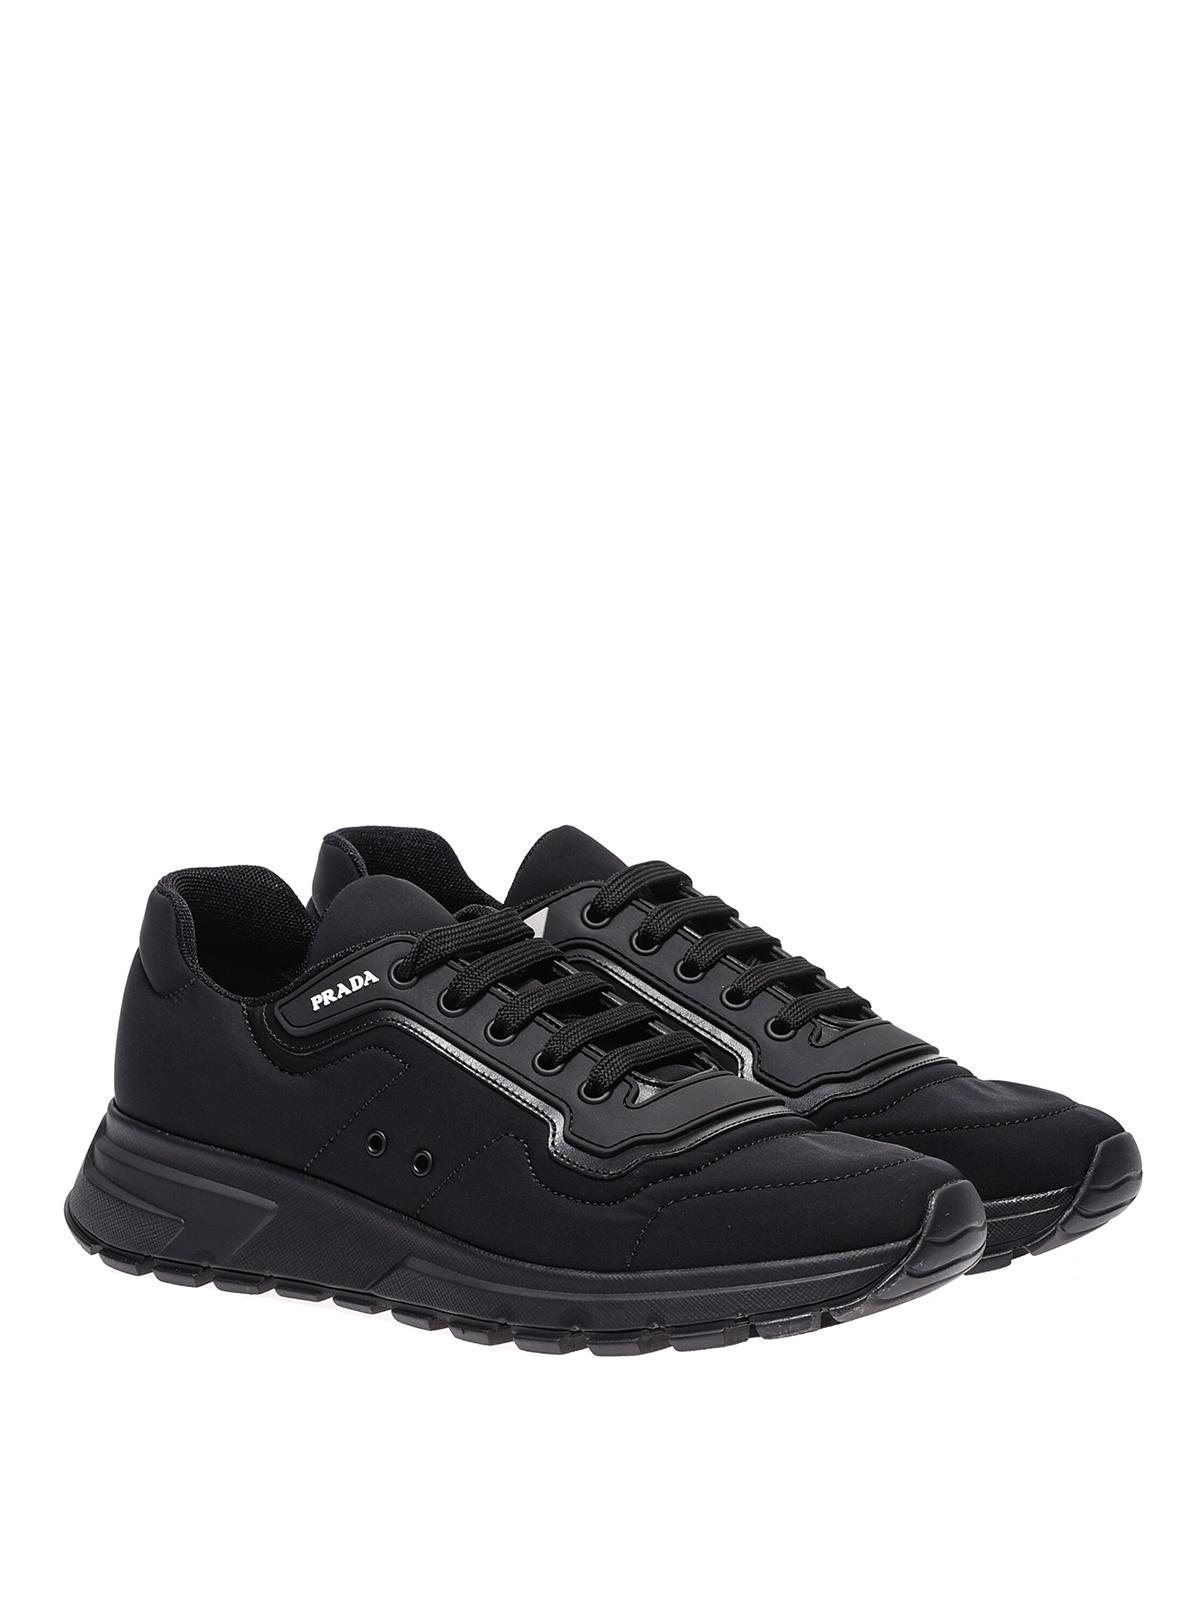 bb4ed04a97303b prada-online -trainers-gabardine-soft-black-low-top-sneakers-00000151950f00s002.jpg